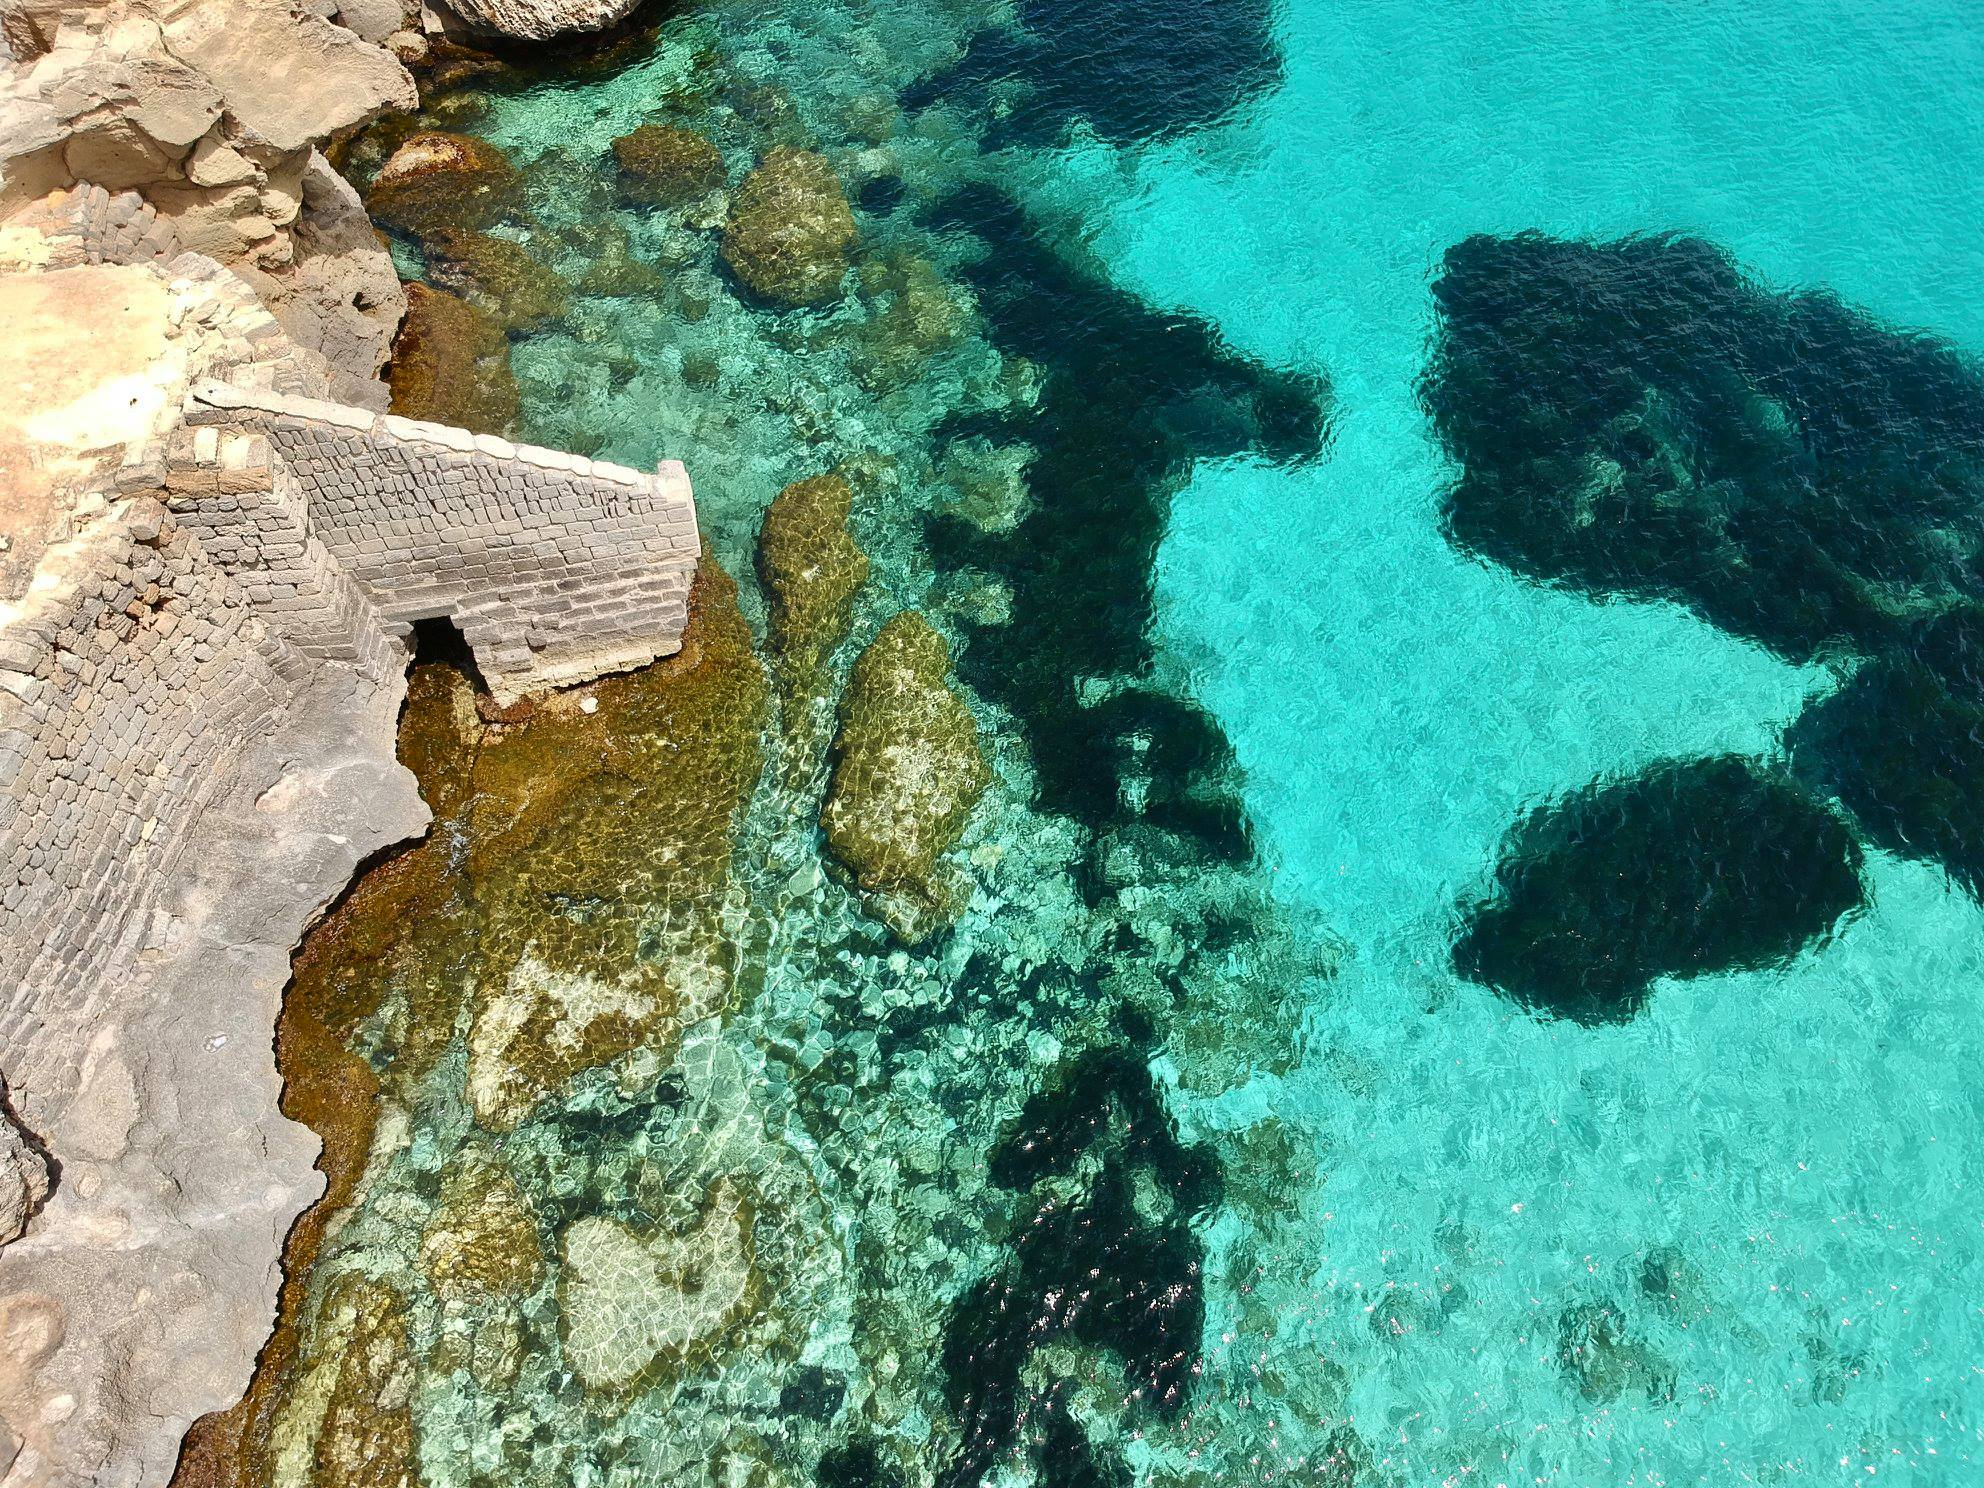 sicily ariel view of bright turqoise ocean